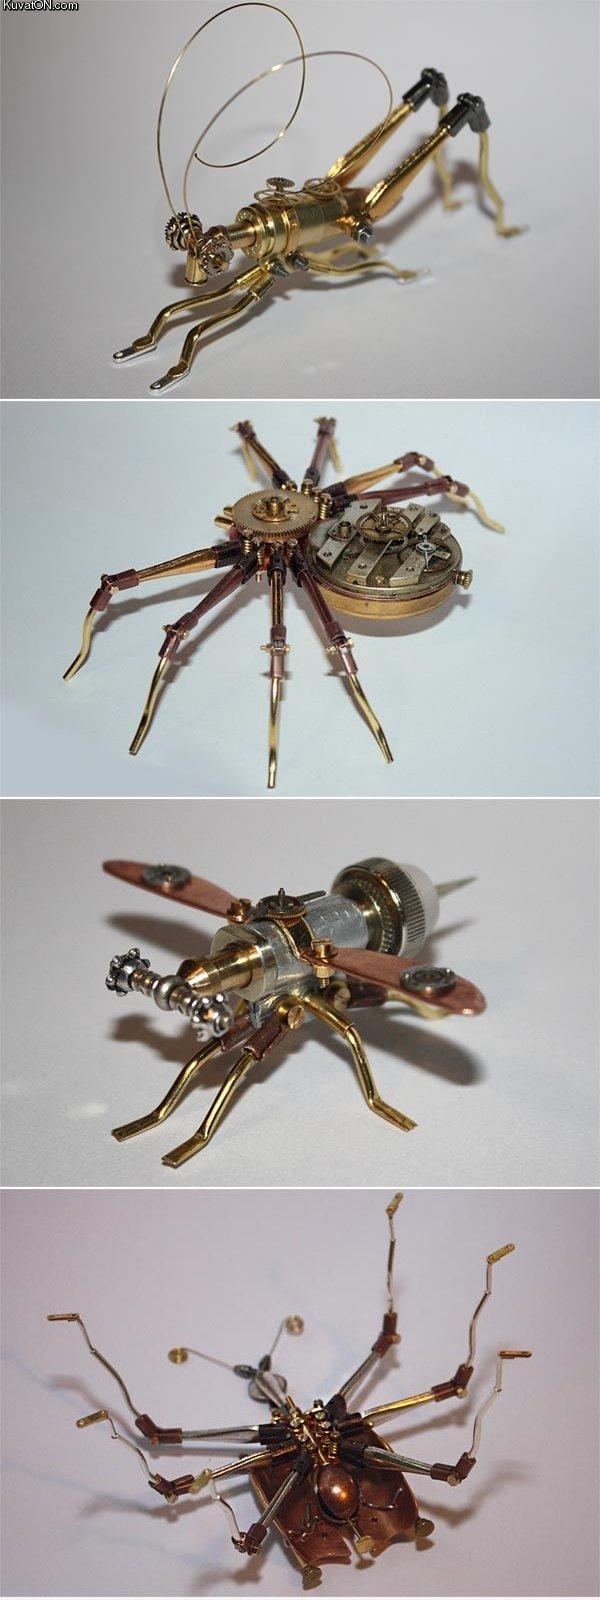 steampunk_bugs.jpg